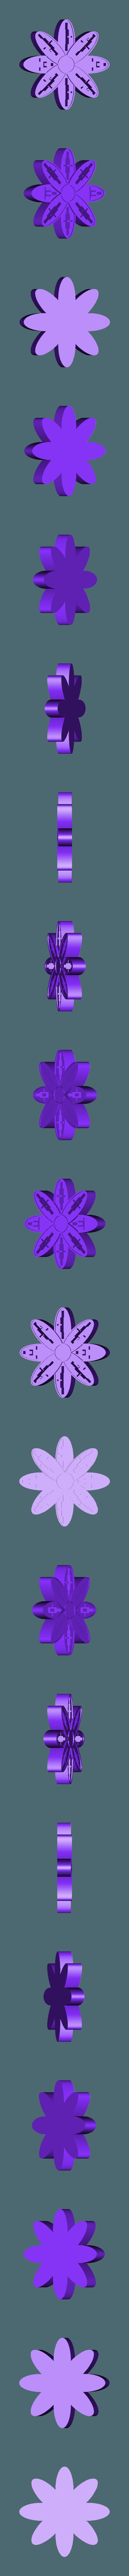 "Margarita_3_in_1_USB_SD_MicroSD.obj Download free OBJ file USB Organizer 3 in 1 ""Daisy Flower"" (Margarita) • 3D printer object, PaulDrones"